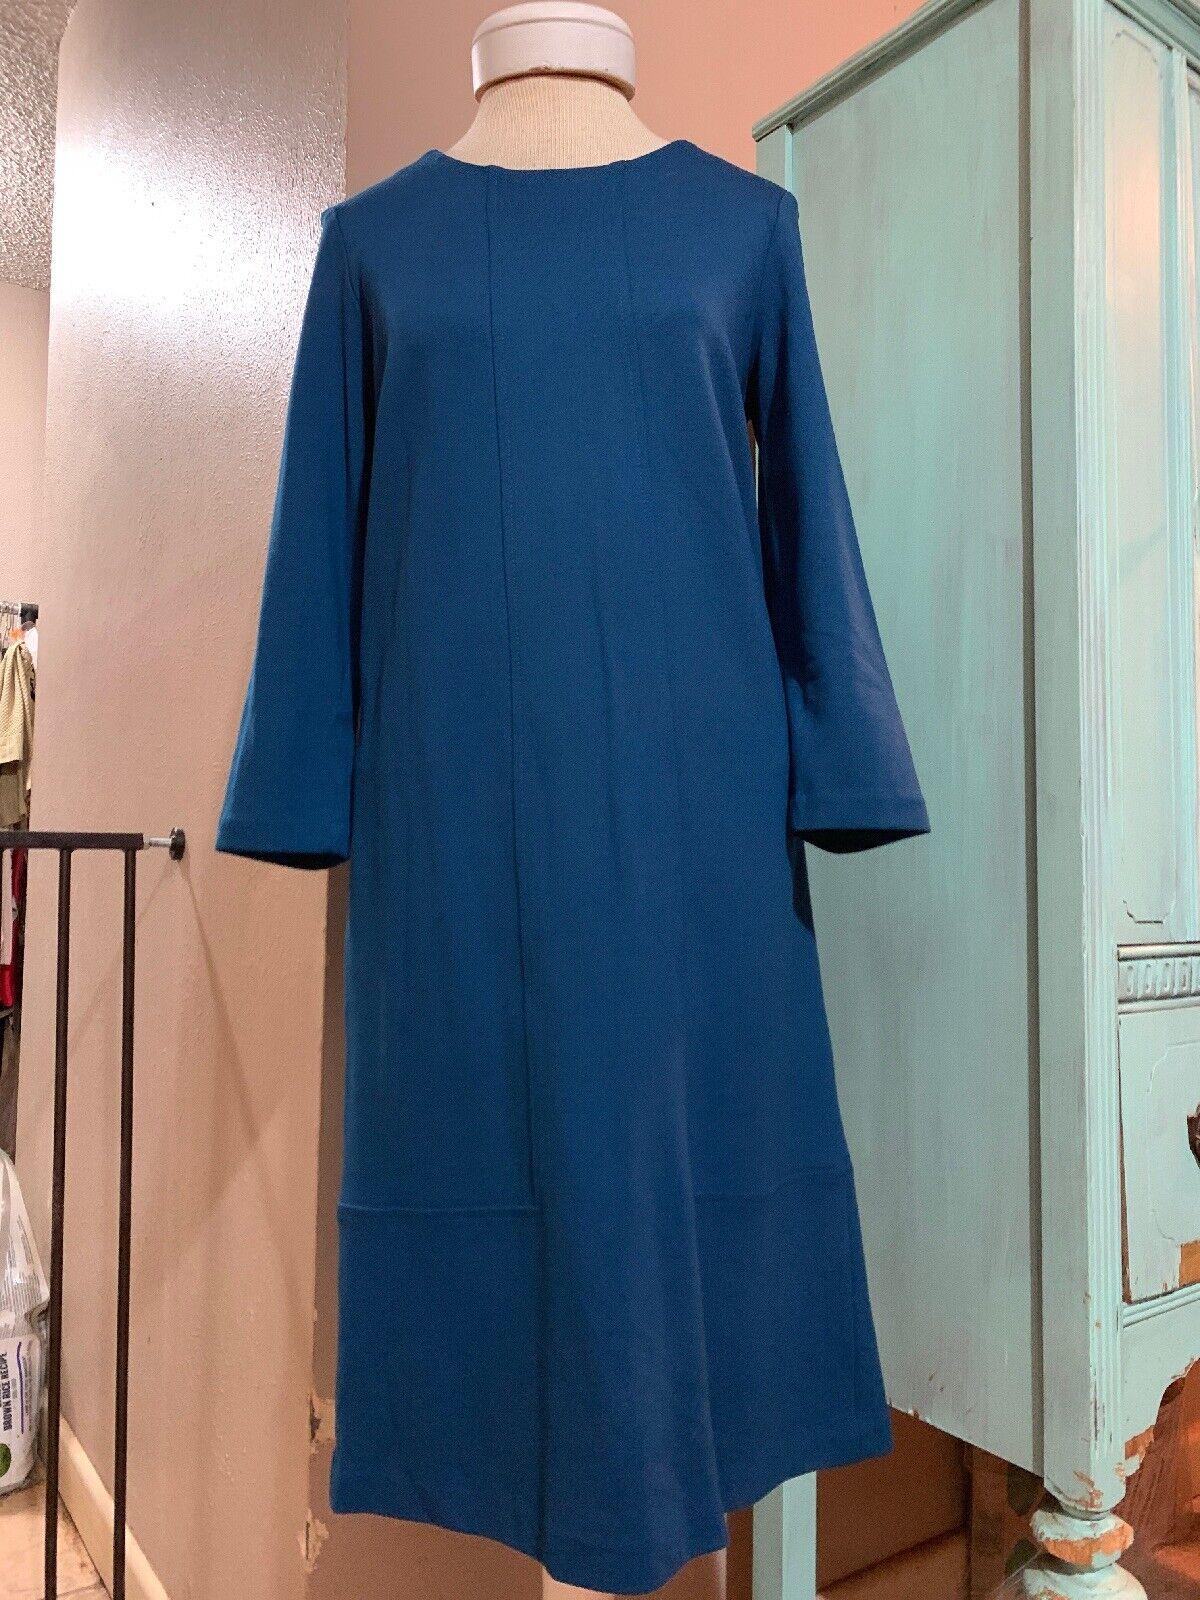 J Jill Ponte  Small Teal Green bluee Stretch Knit Dress Viscose Blend 3 4 Sleeve